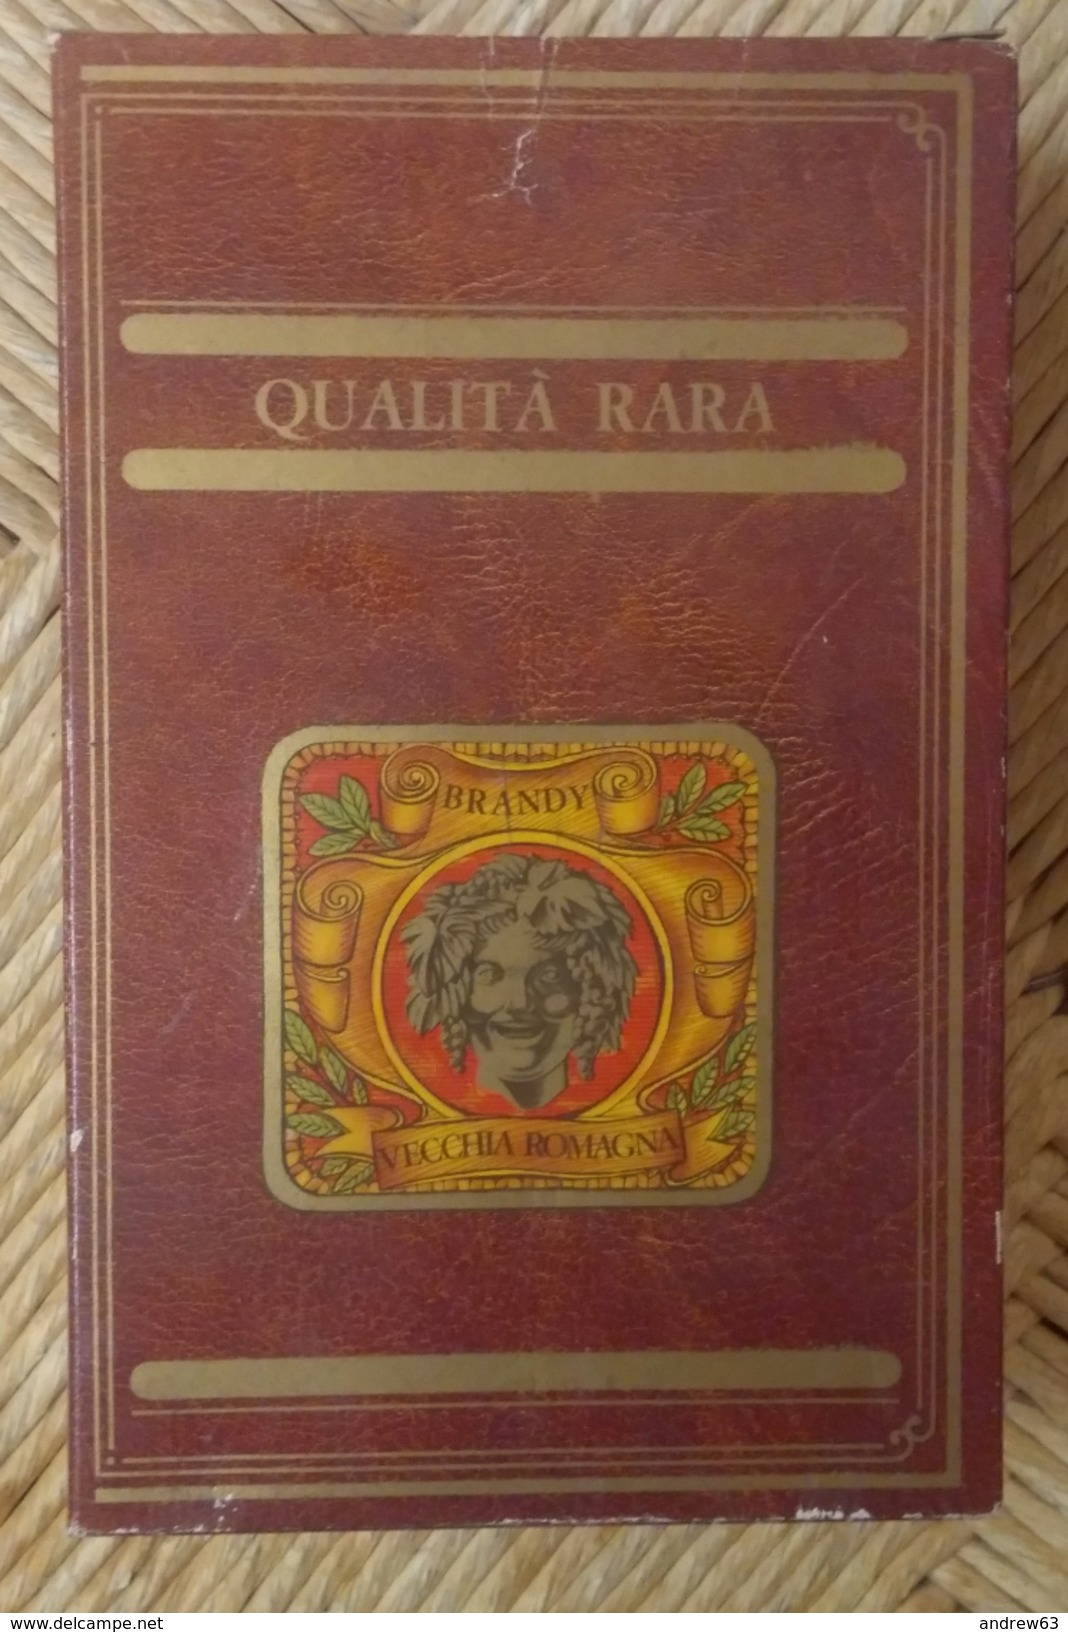 BRANDY VECCHIA ROMAGNA QUALITA' RARA GIO BUTON Lt. 0,750 Gr. 41° + BOX N° 38879 - Licor Espirituoso